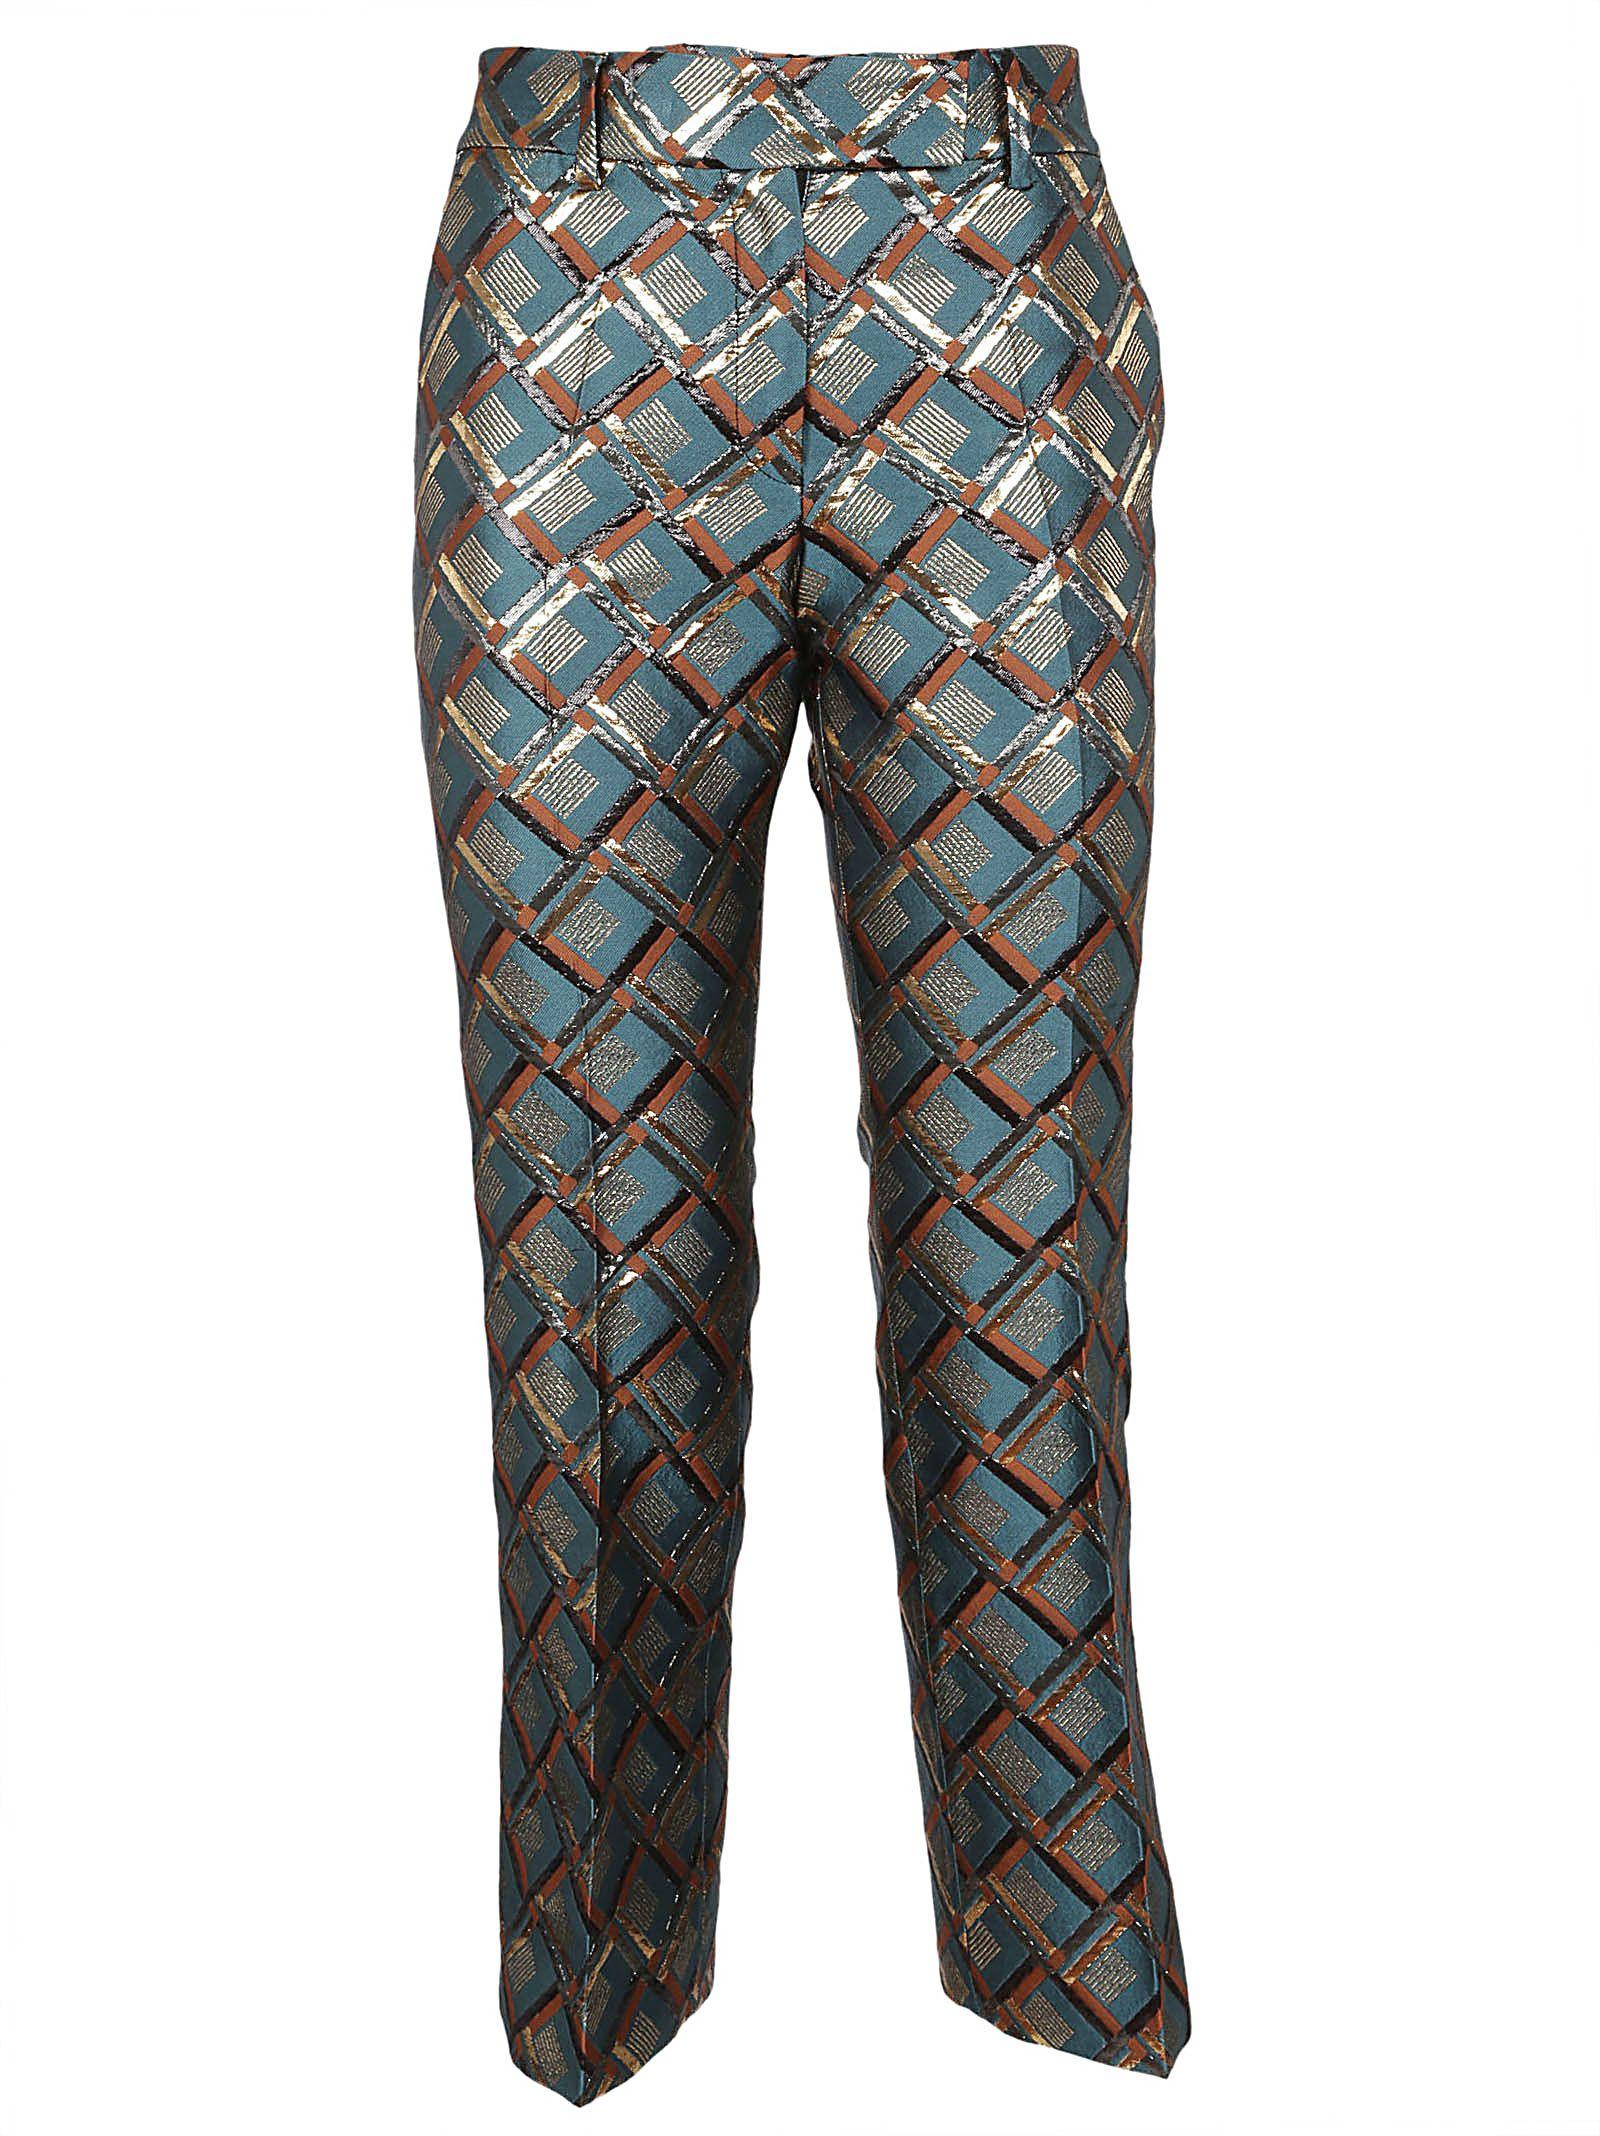 TRUE ROYAL Patterned Trousers in Verde